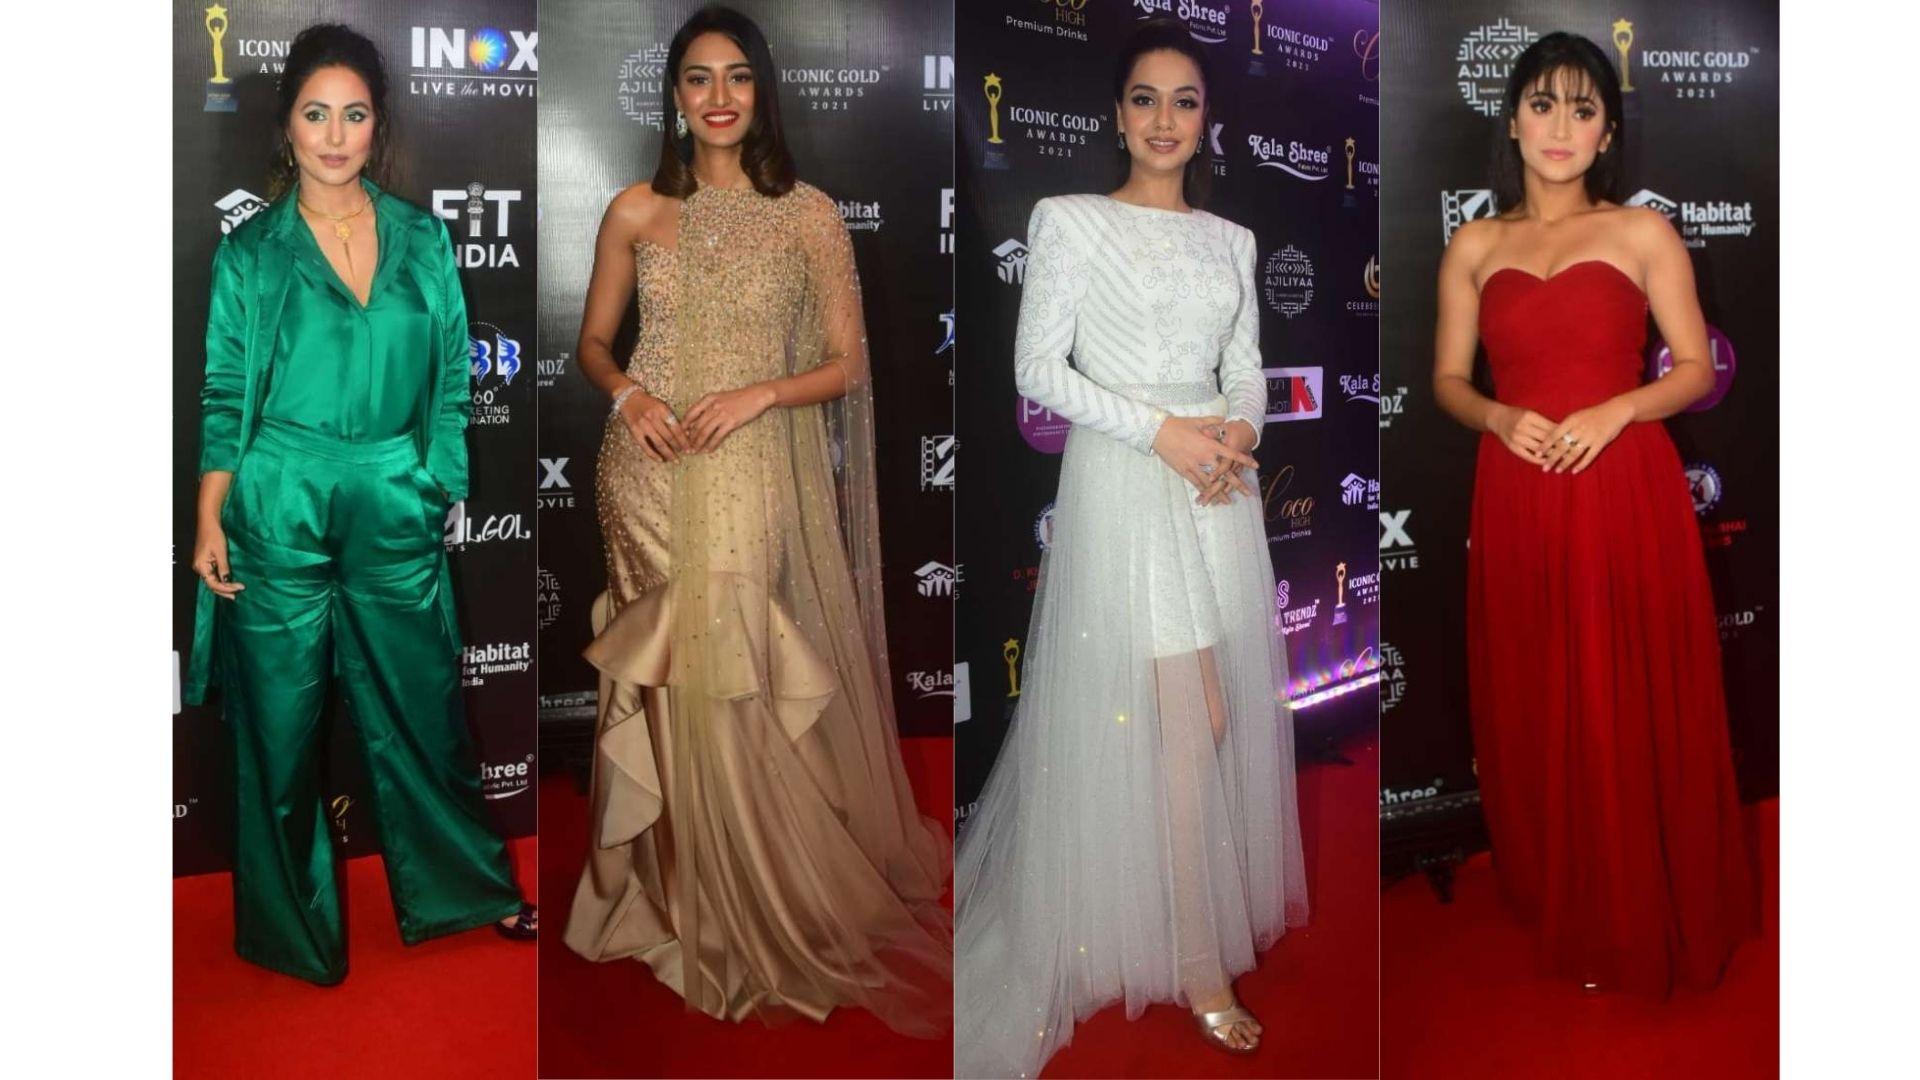 Iconic Gold Awards Red Carpet: Hina Khan, Shivangi Joshi, Surbhi Chandna And Others Make A Fashion Splash